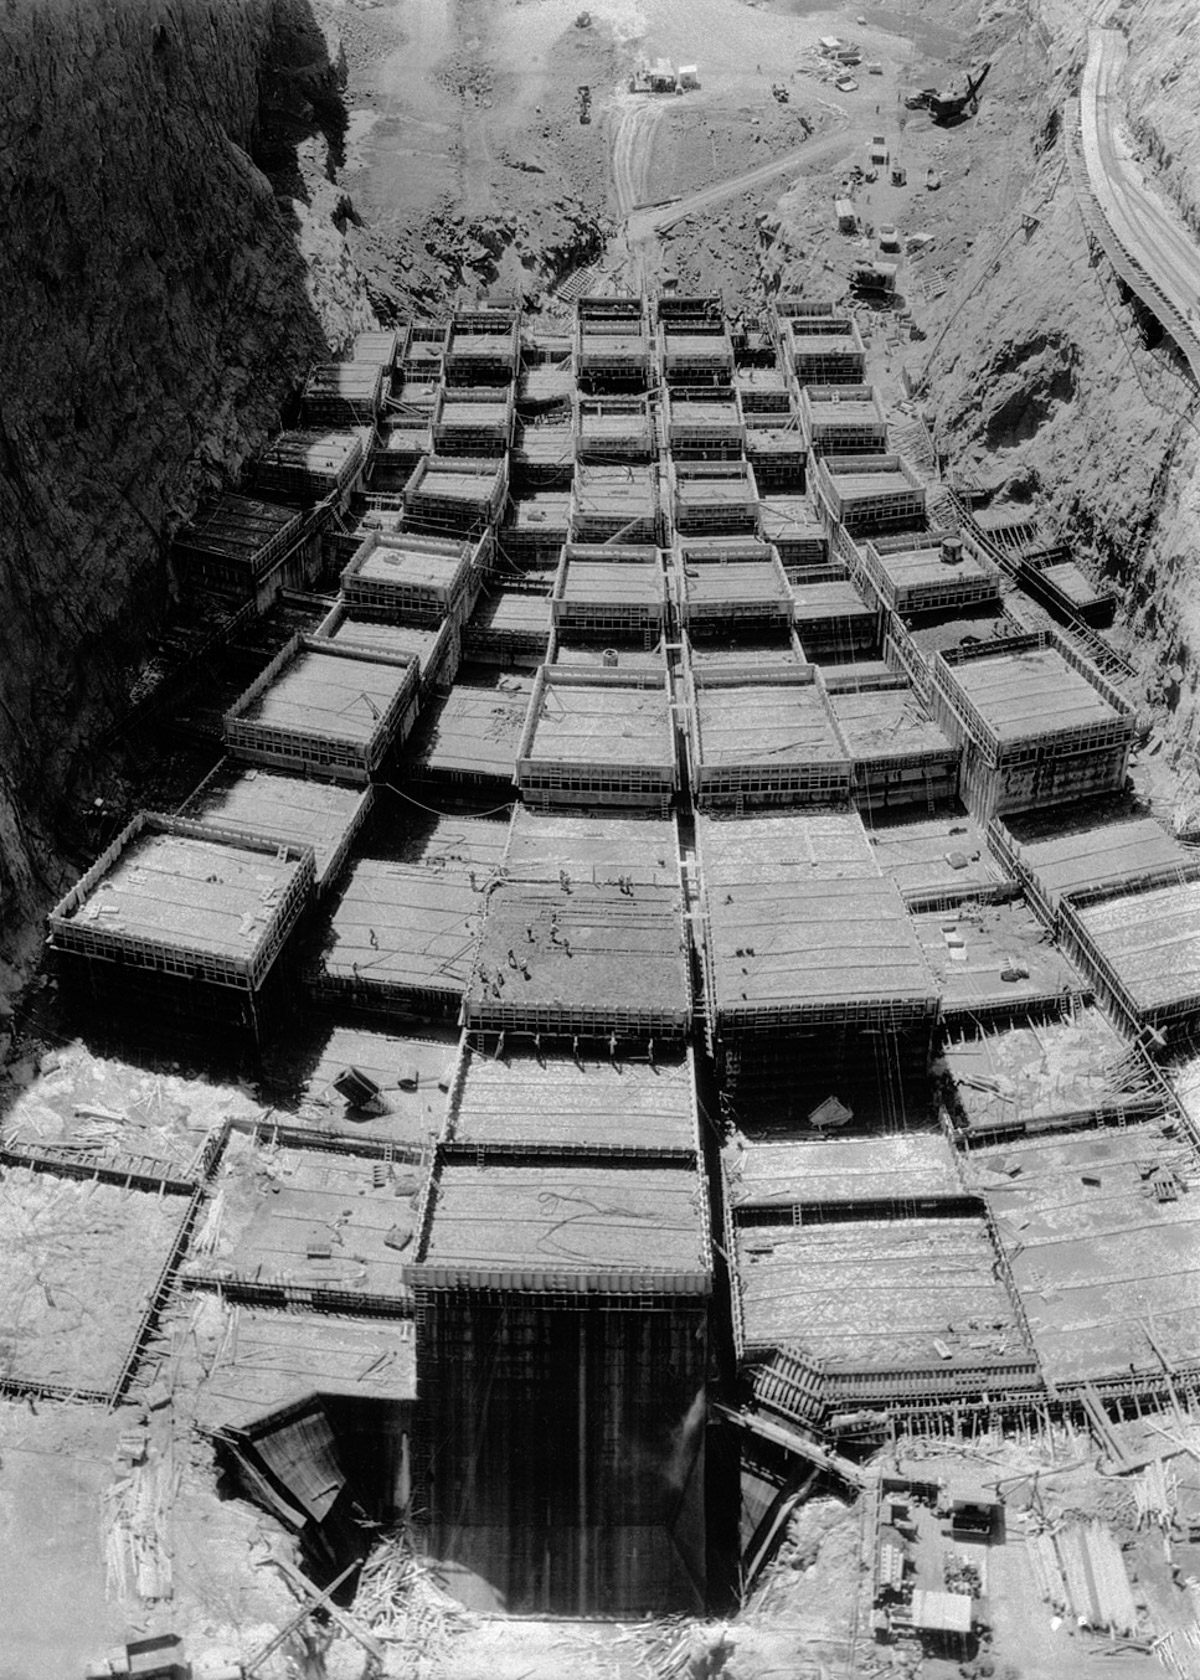 11 Sep 1933, Boulder, Colorado, USA --- Original caption: Progress of Boulder Dam construction. Striking scenes of the progress of the construction work on Boulder Dam. This photo shows the concrete and steel foundation of the dam. --- Image by © Bettmann/CORBIS